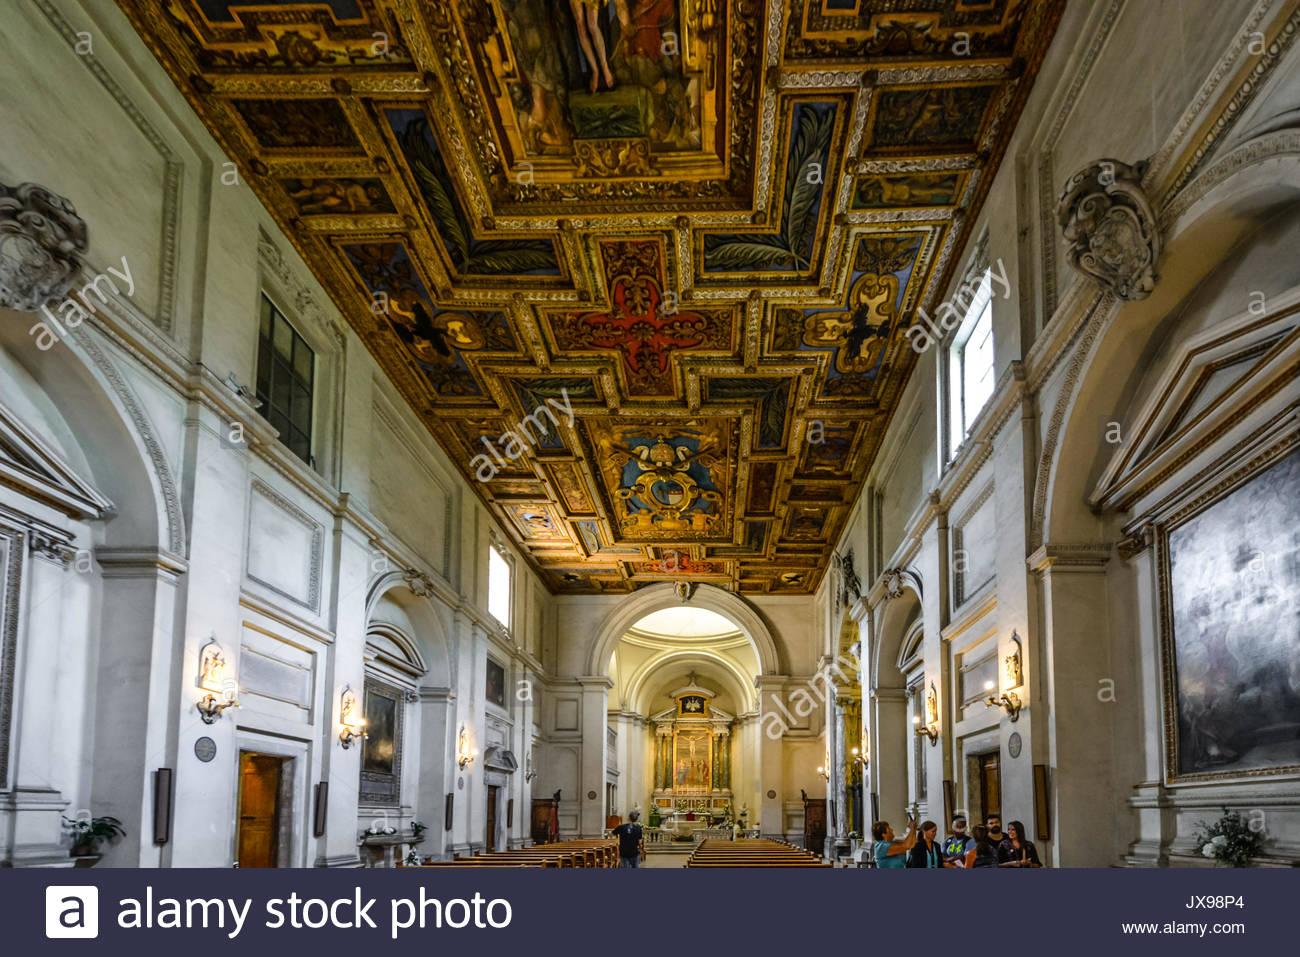 Innenraum der Kirche des Heiligen Sebastian in den Katakomben von San Sebastiano in Rom Italien Stockfoto